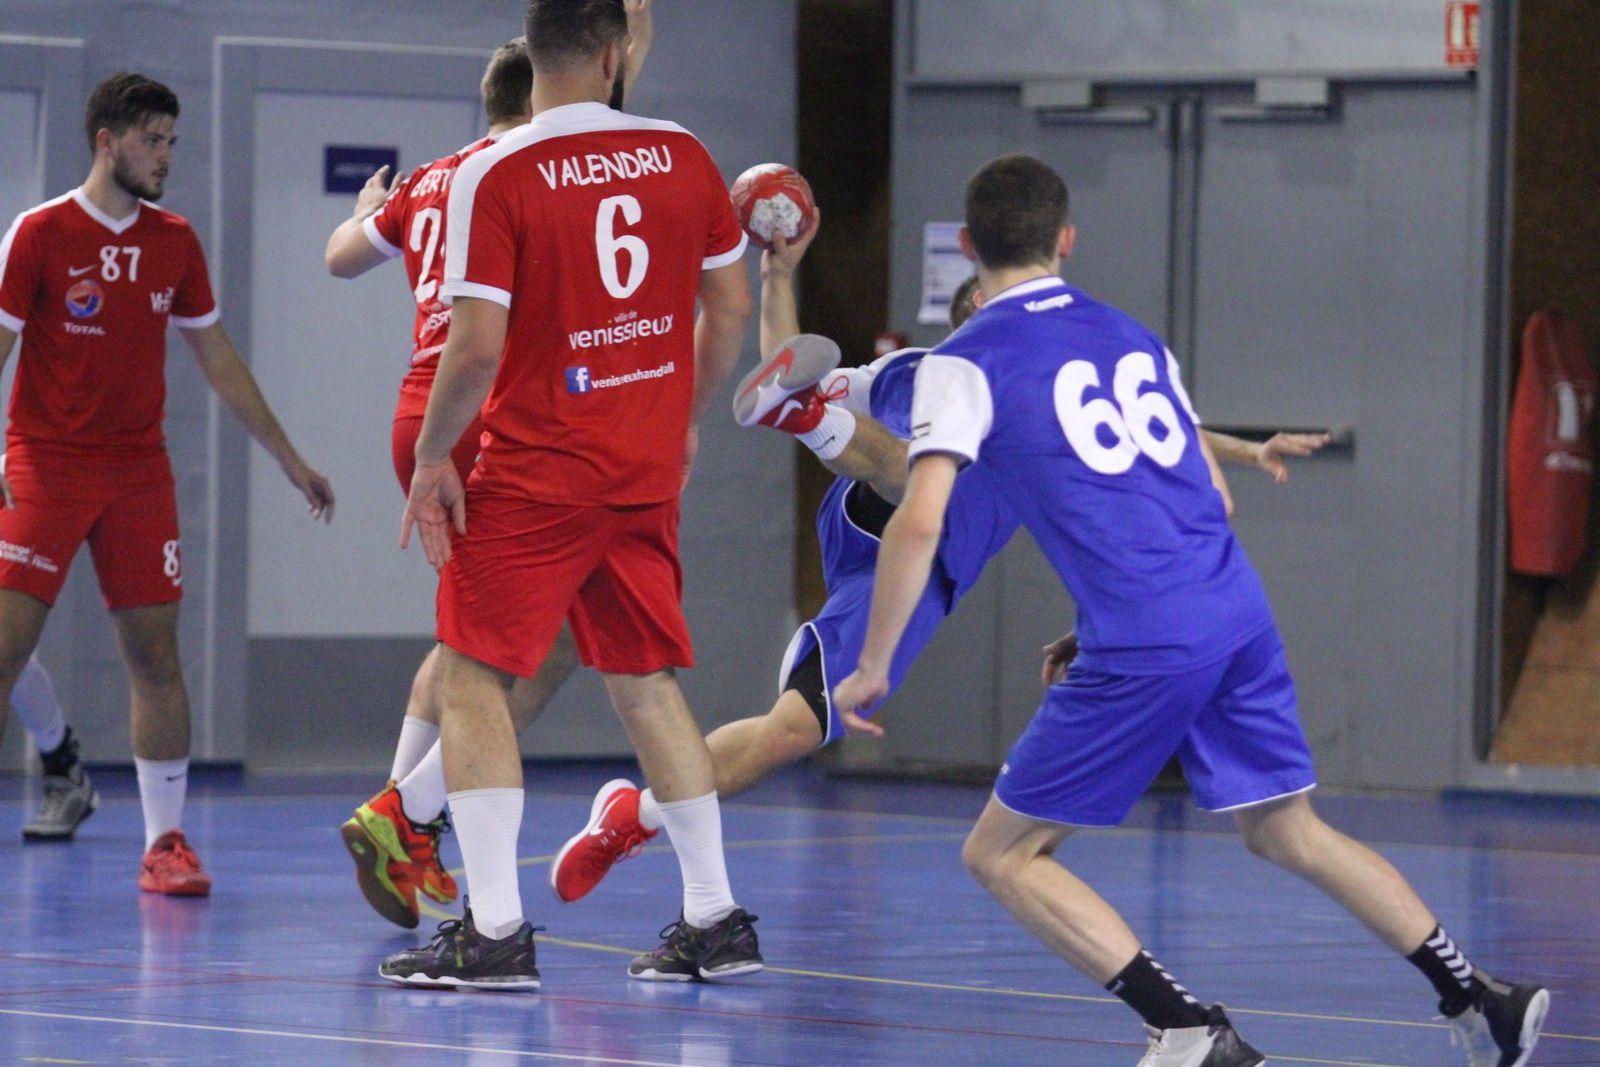 V nissieux handball sera pr sent au 3e tour de la coupe de france sports v nissians - Handball coupe de france ...